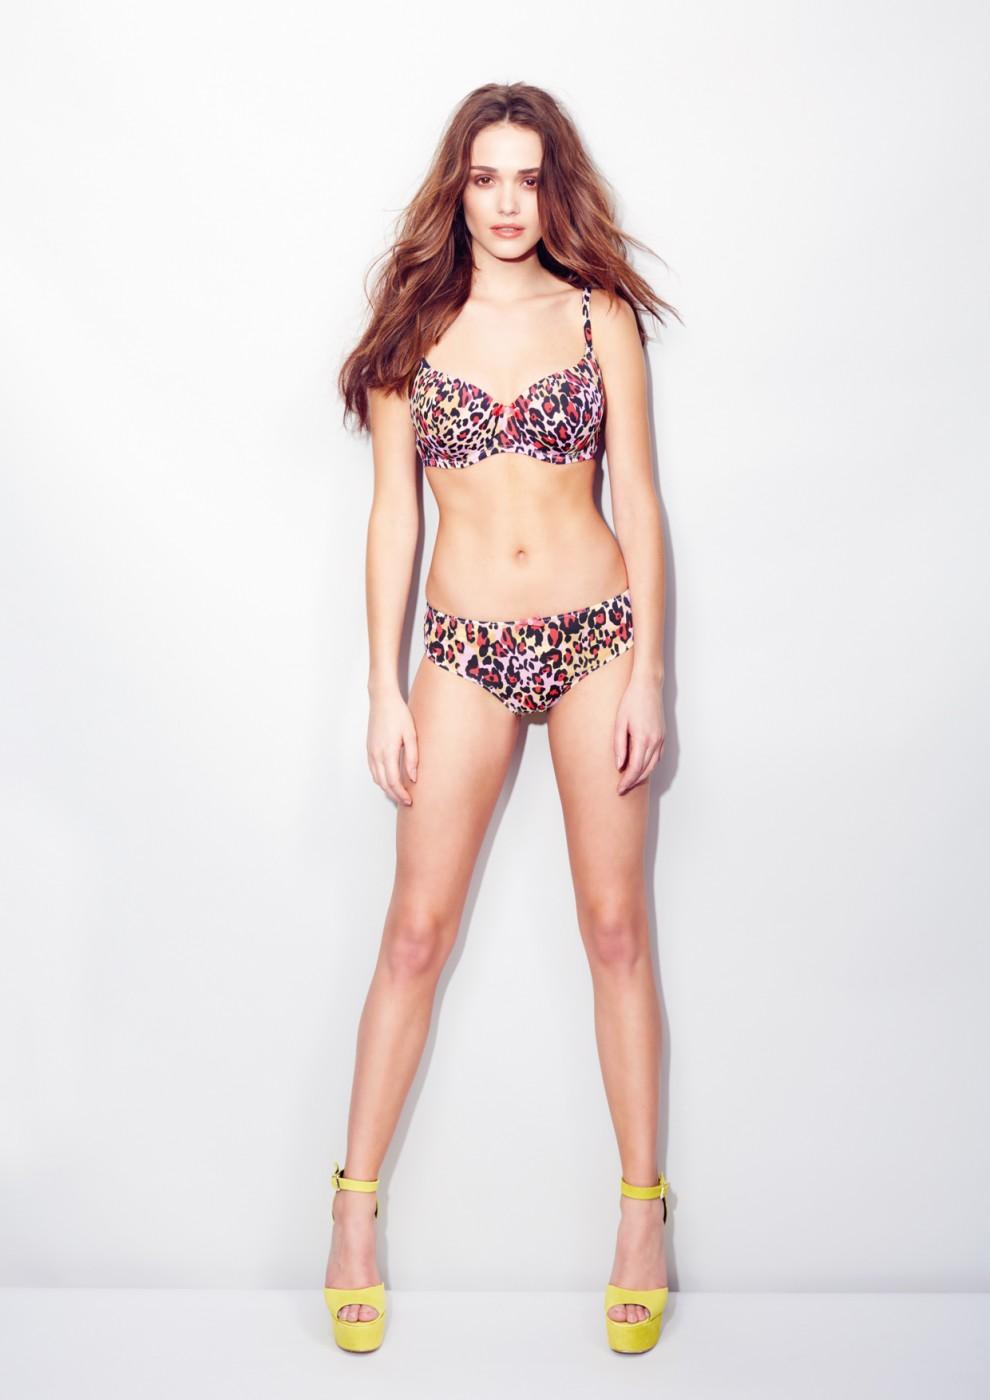 Amber Elkins Martinez in lingerie